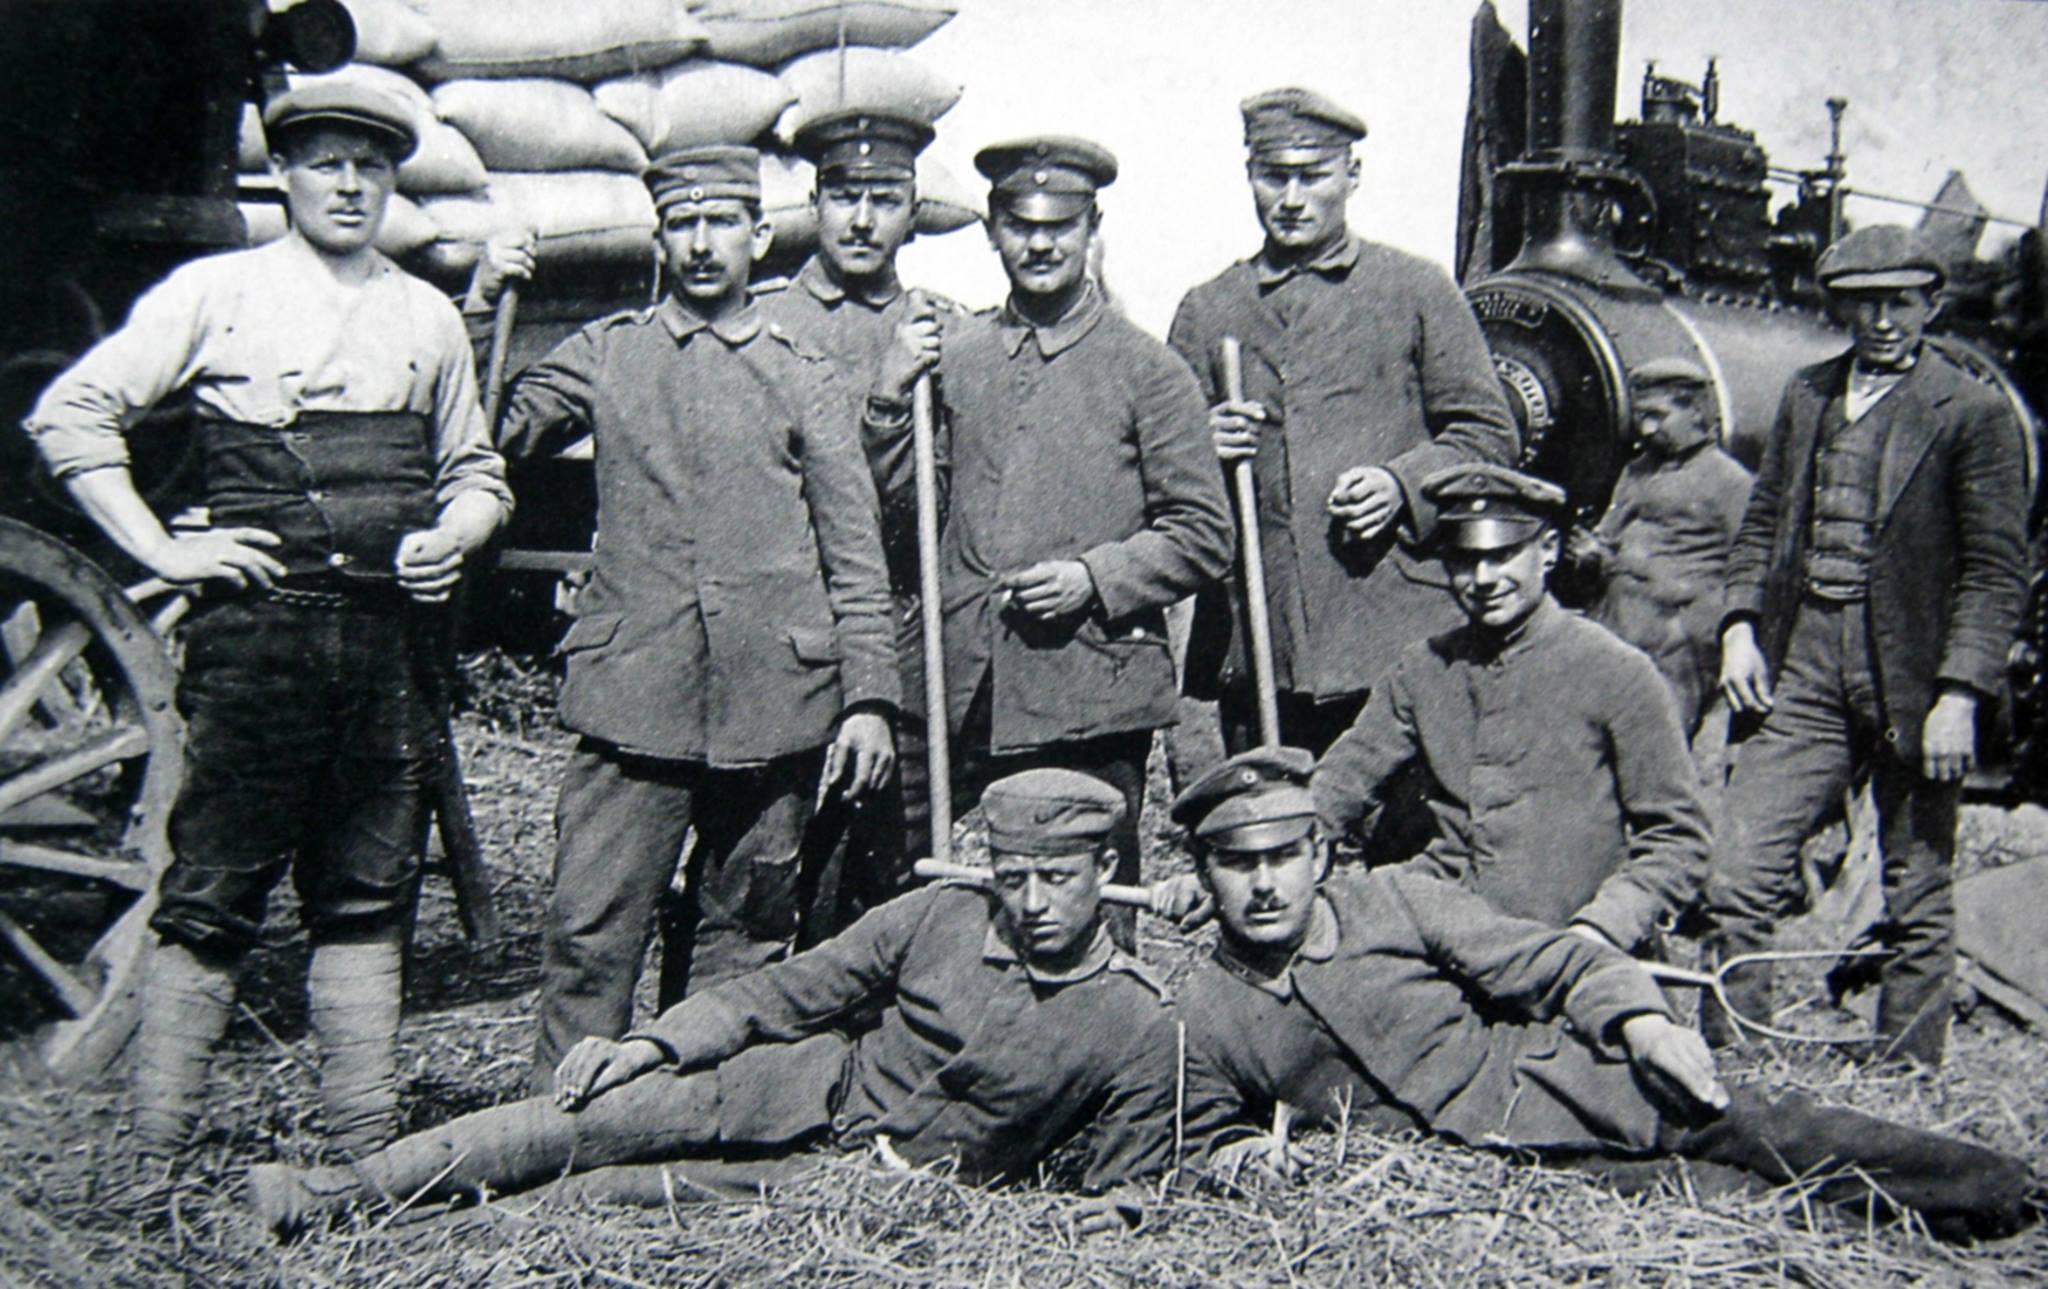 Prisoners of War working at Worths Farm near Holbeach in 1916.